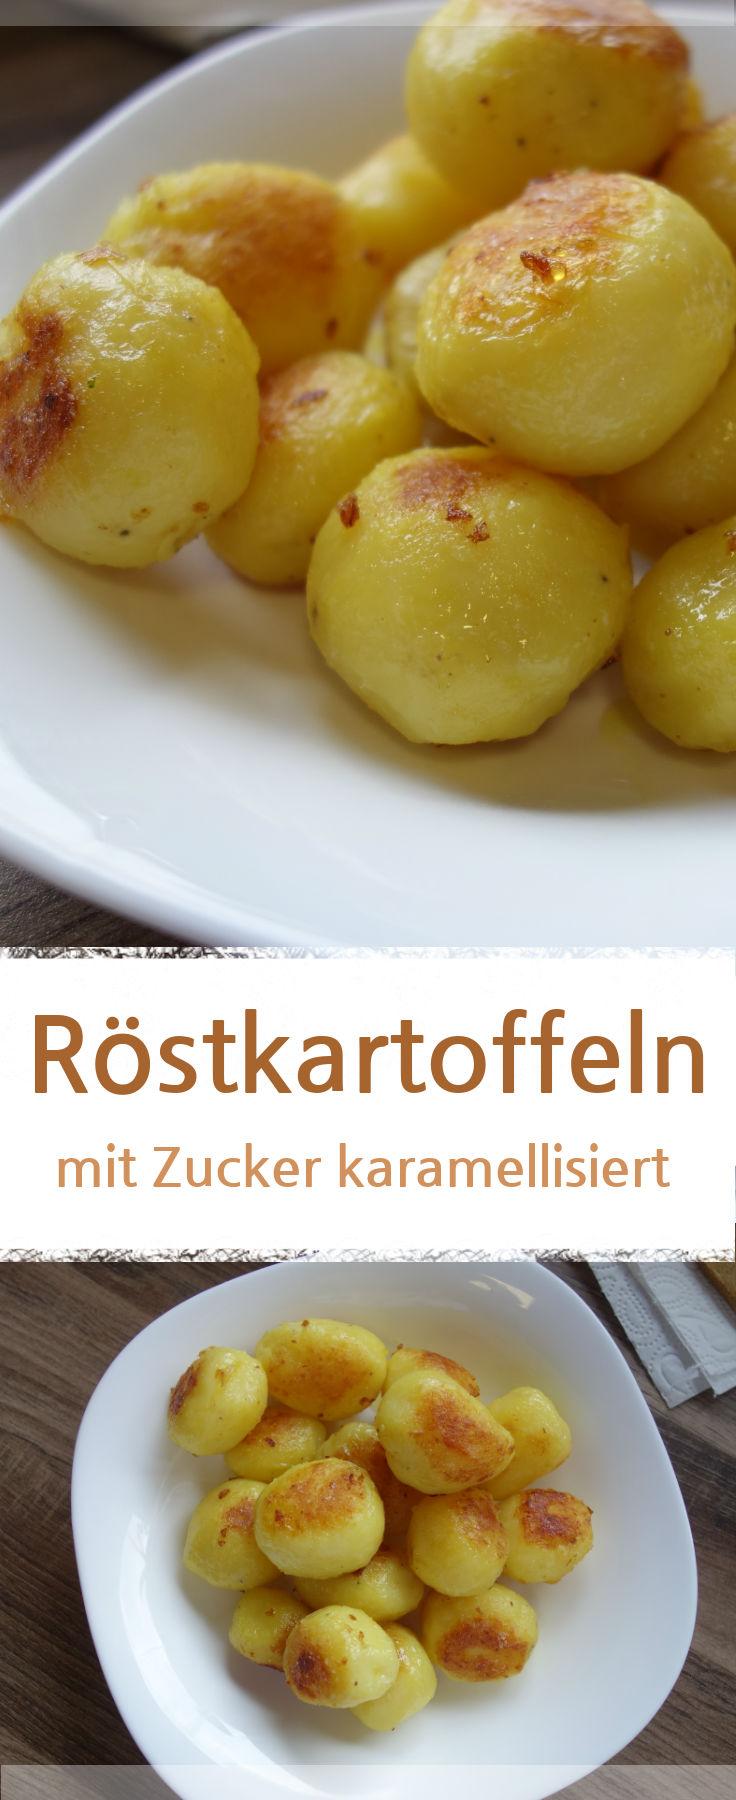 roestkartoffeln-karamellisiert-wl.jpg